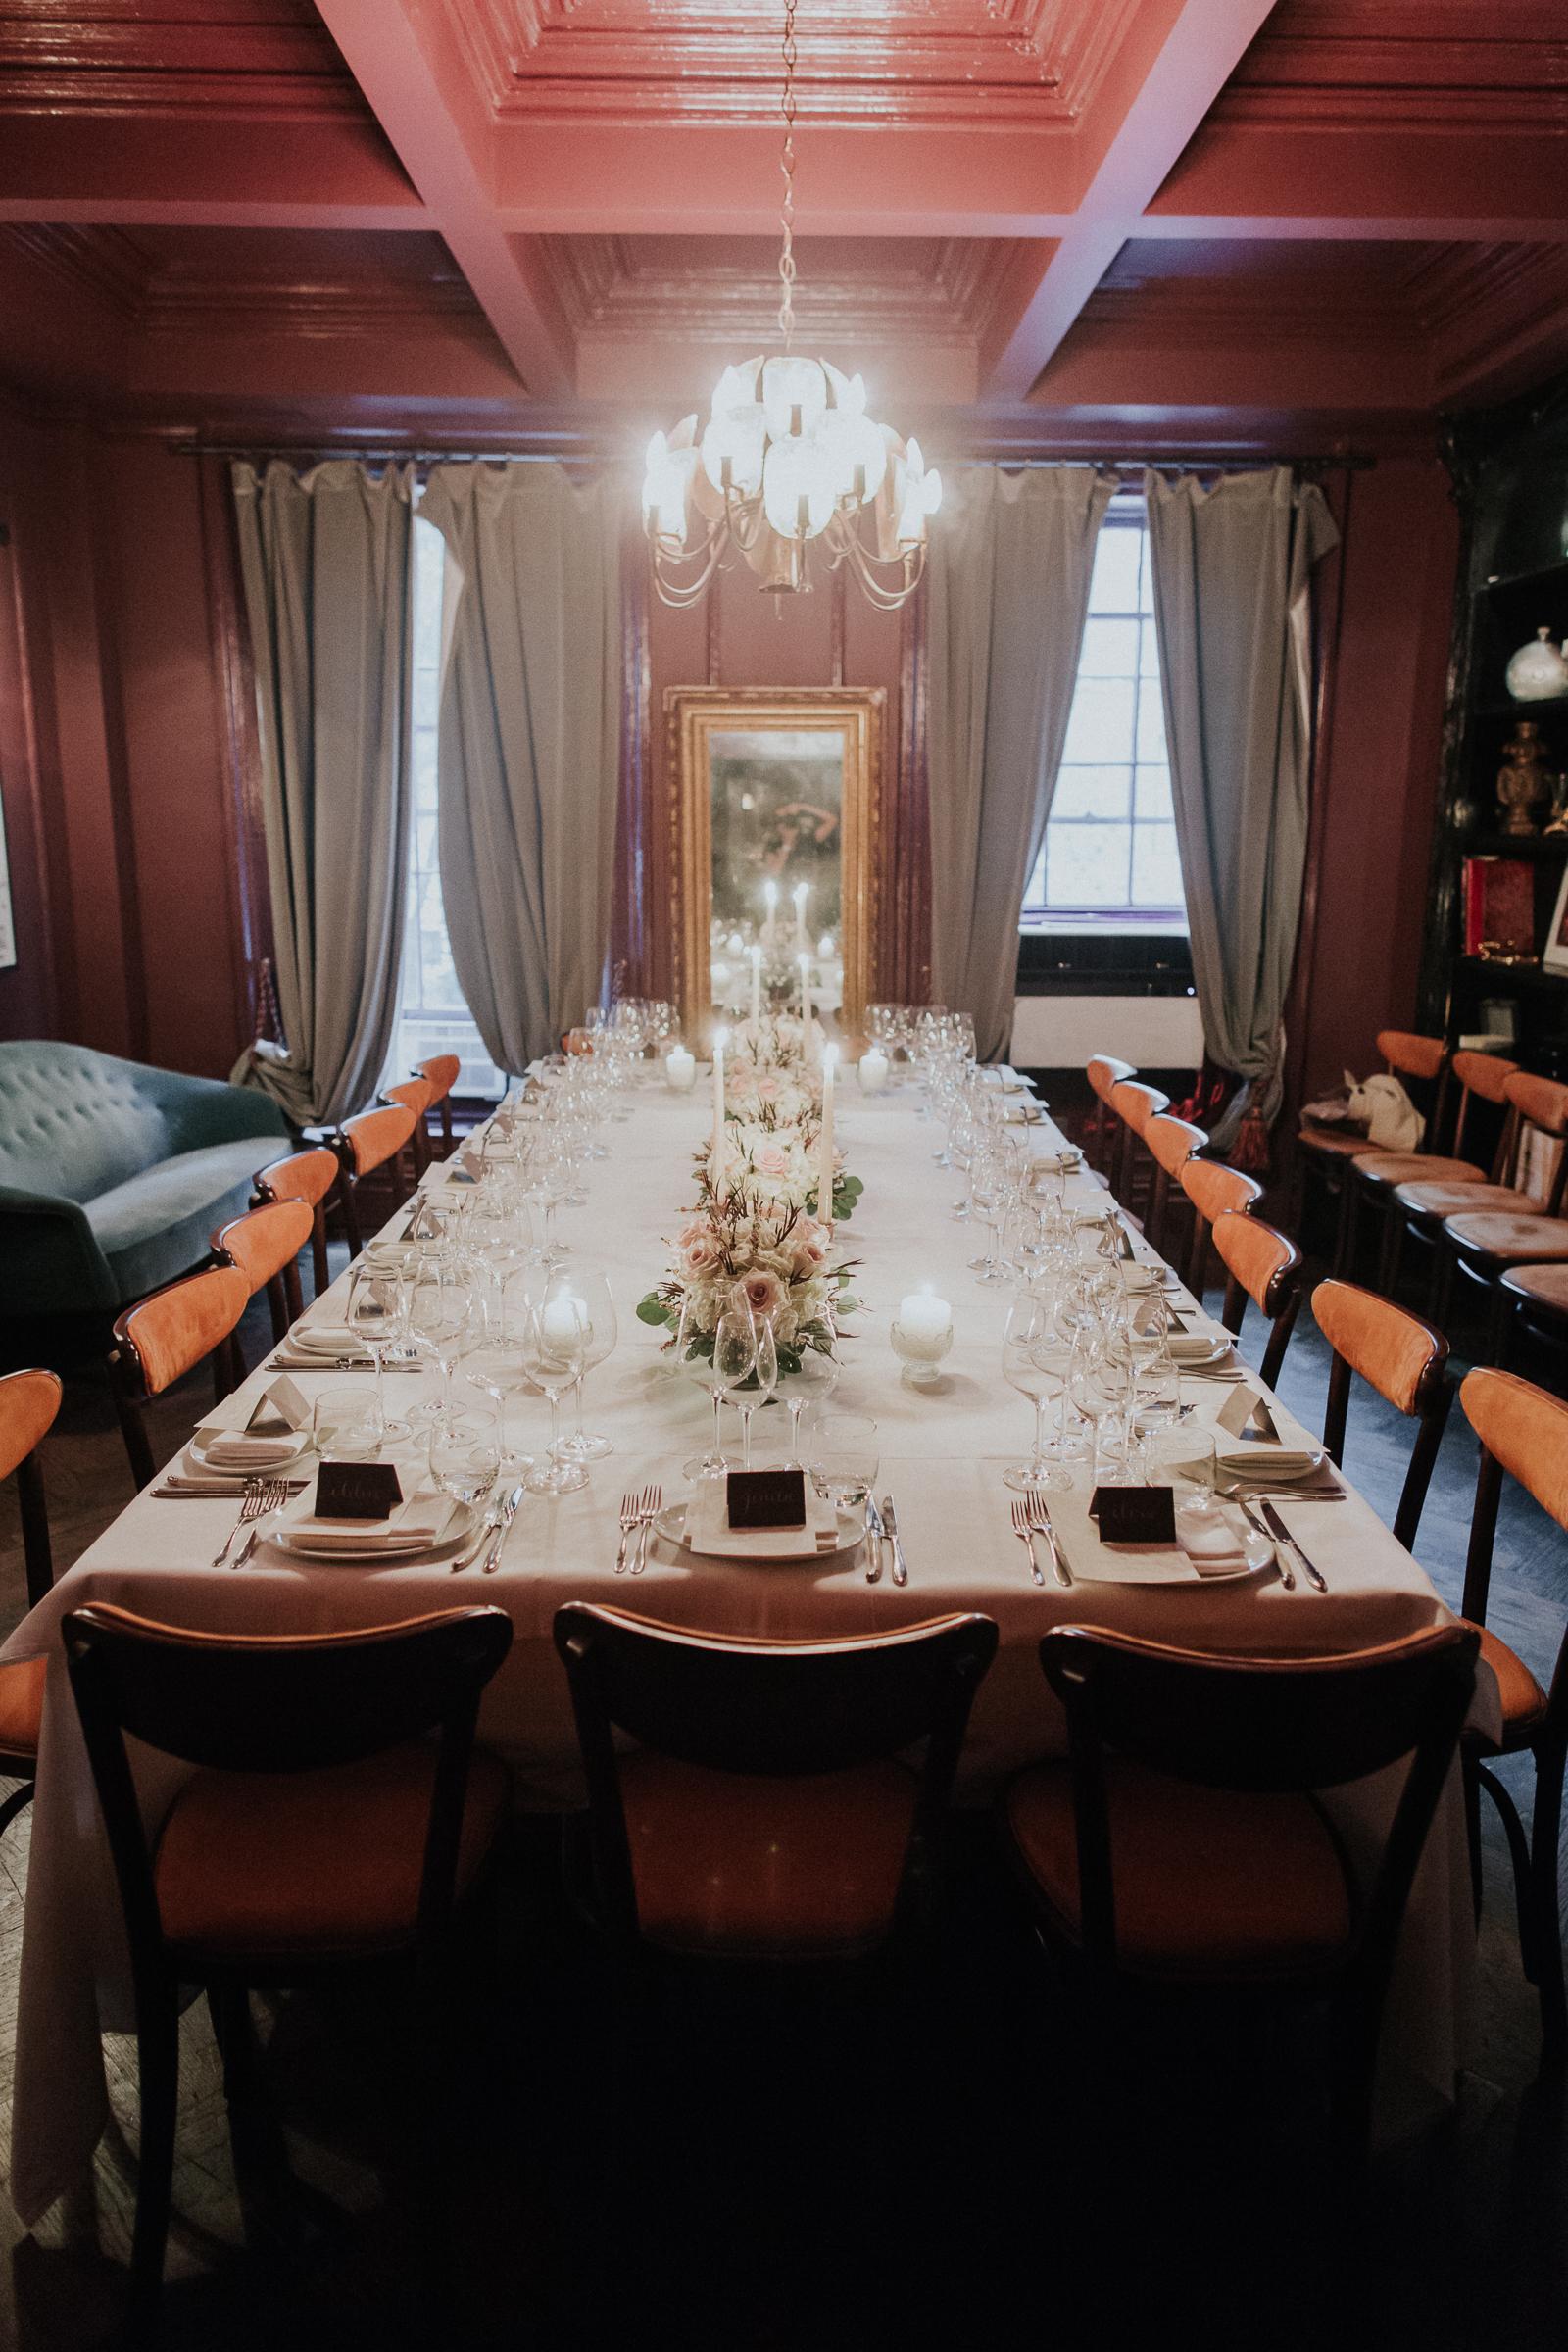 Casa-Apicii-Intimate-Wedding-City-Hall-Elopement-New-York-Documentary-Wedding-Photographer-48.jpg